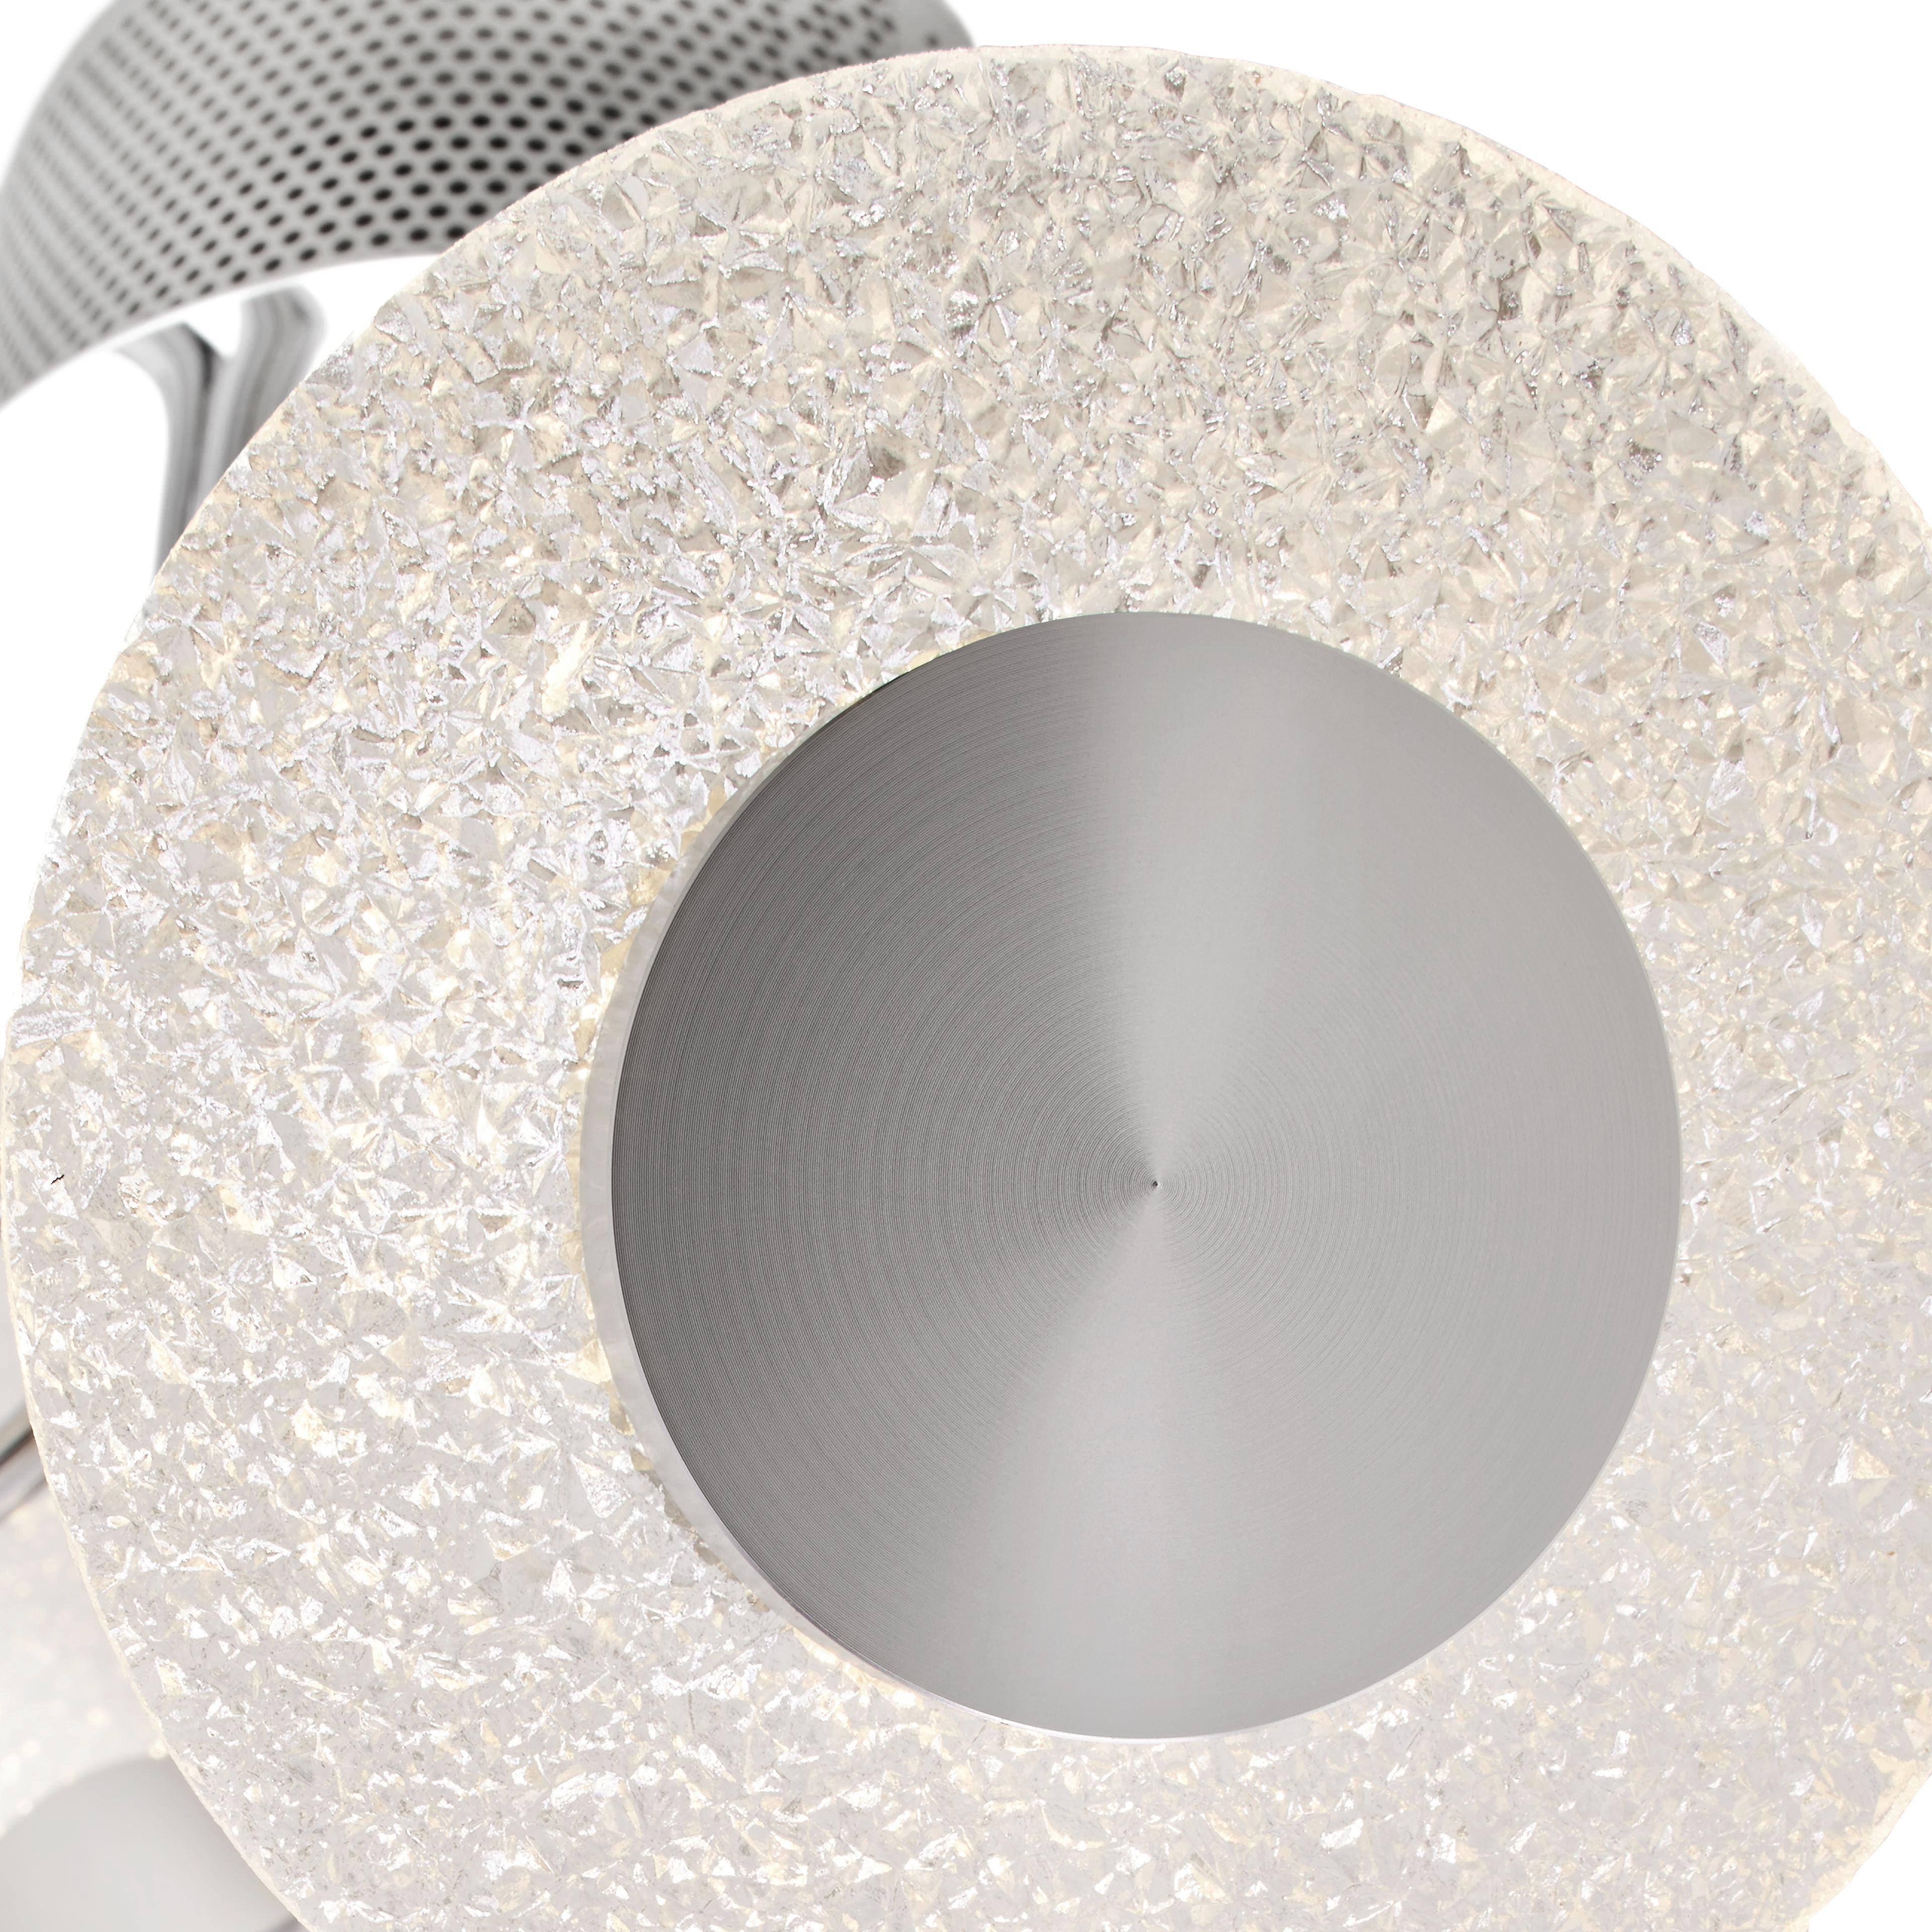 LED-Deckenleuchte Parici - Chromfarben, MODERN, Kunststoff/Metall (42,5/42,5/28cm) - MÖMAX modern living